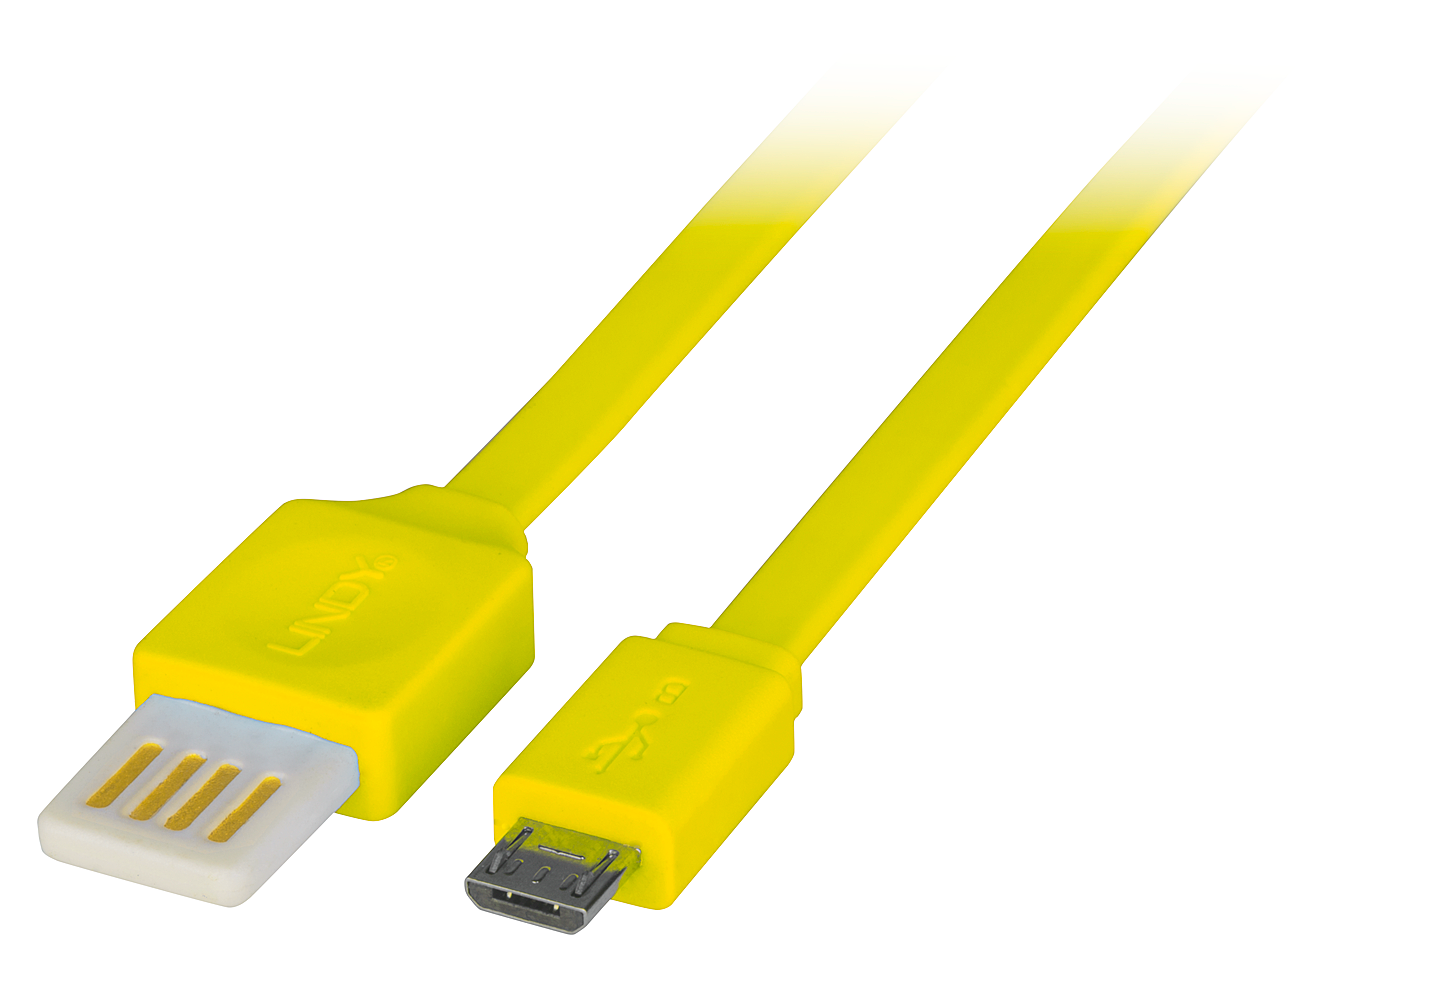 USB 2.0 Reversible Flachband Kabel 0,5m, gelb